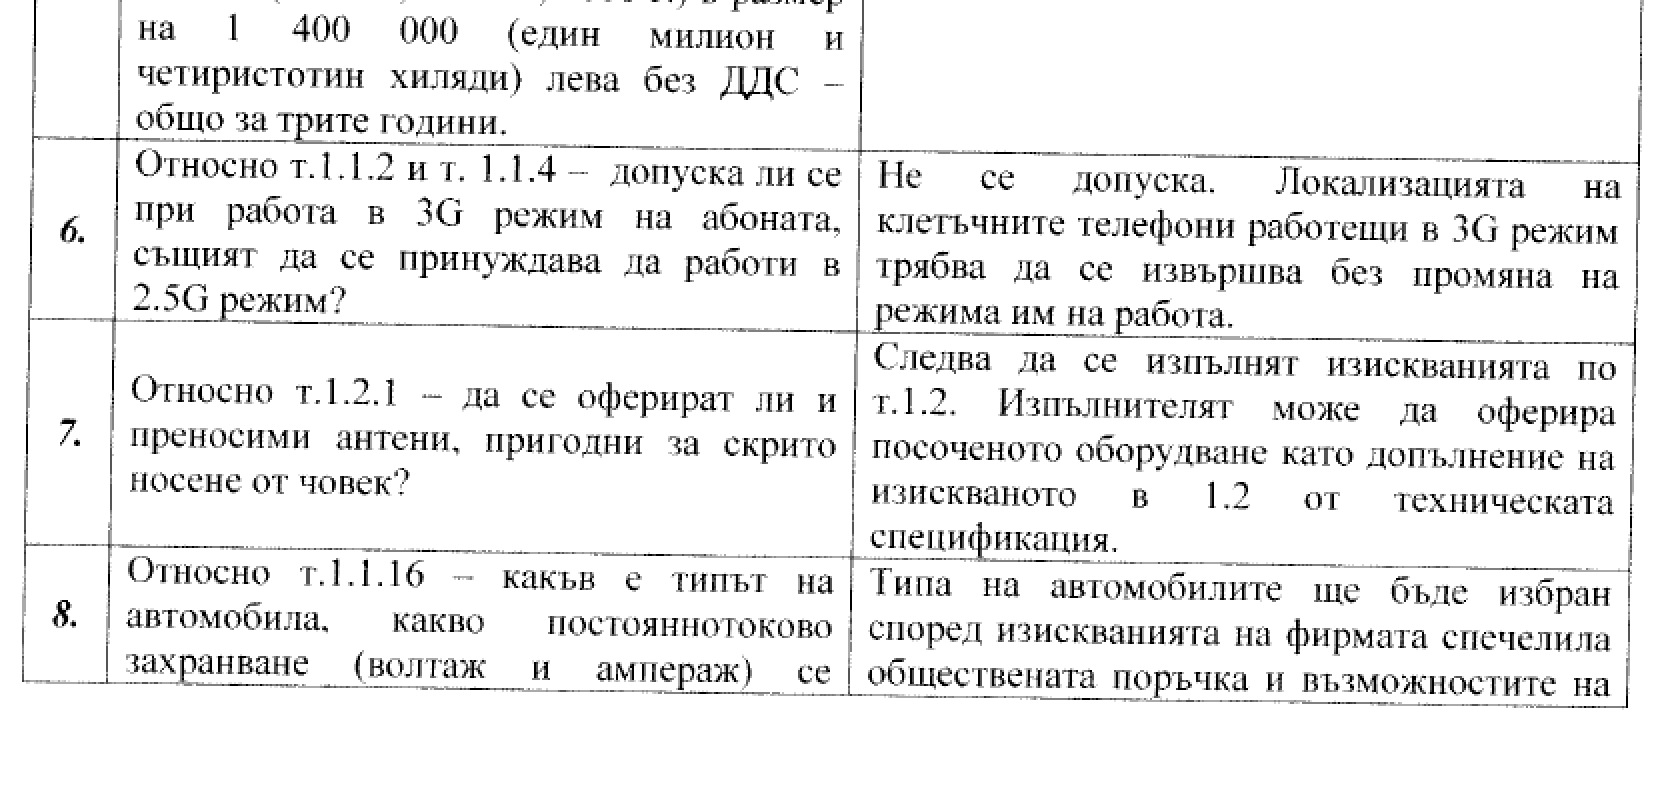 Capture_2013-11-06_a_07.41.45